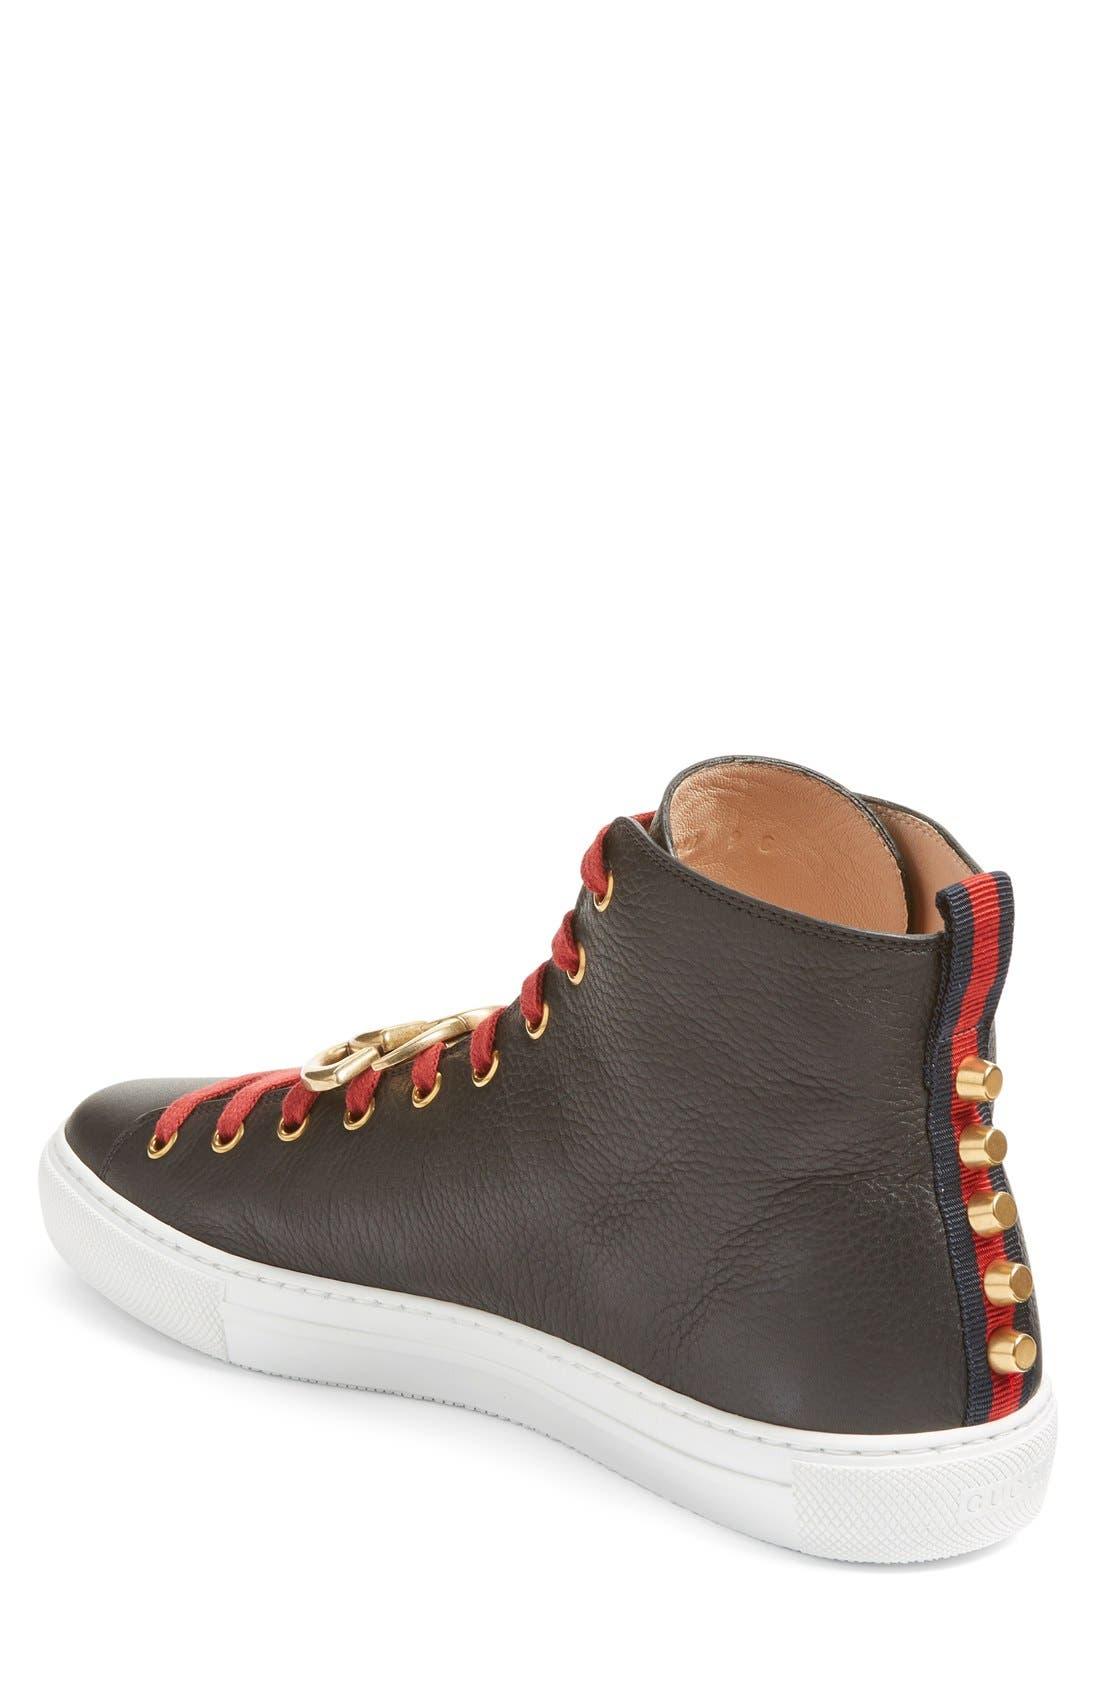 Major High Top Sneaker,                             Alternate thumbnail 7, color,                             007